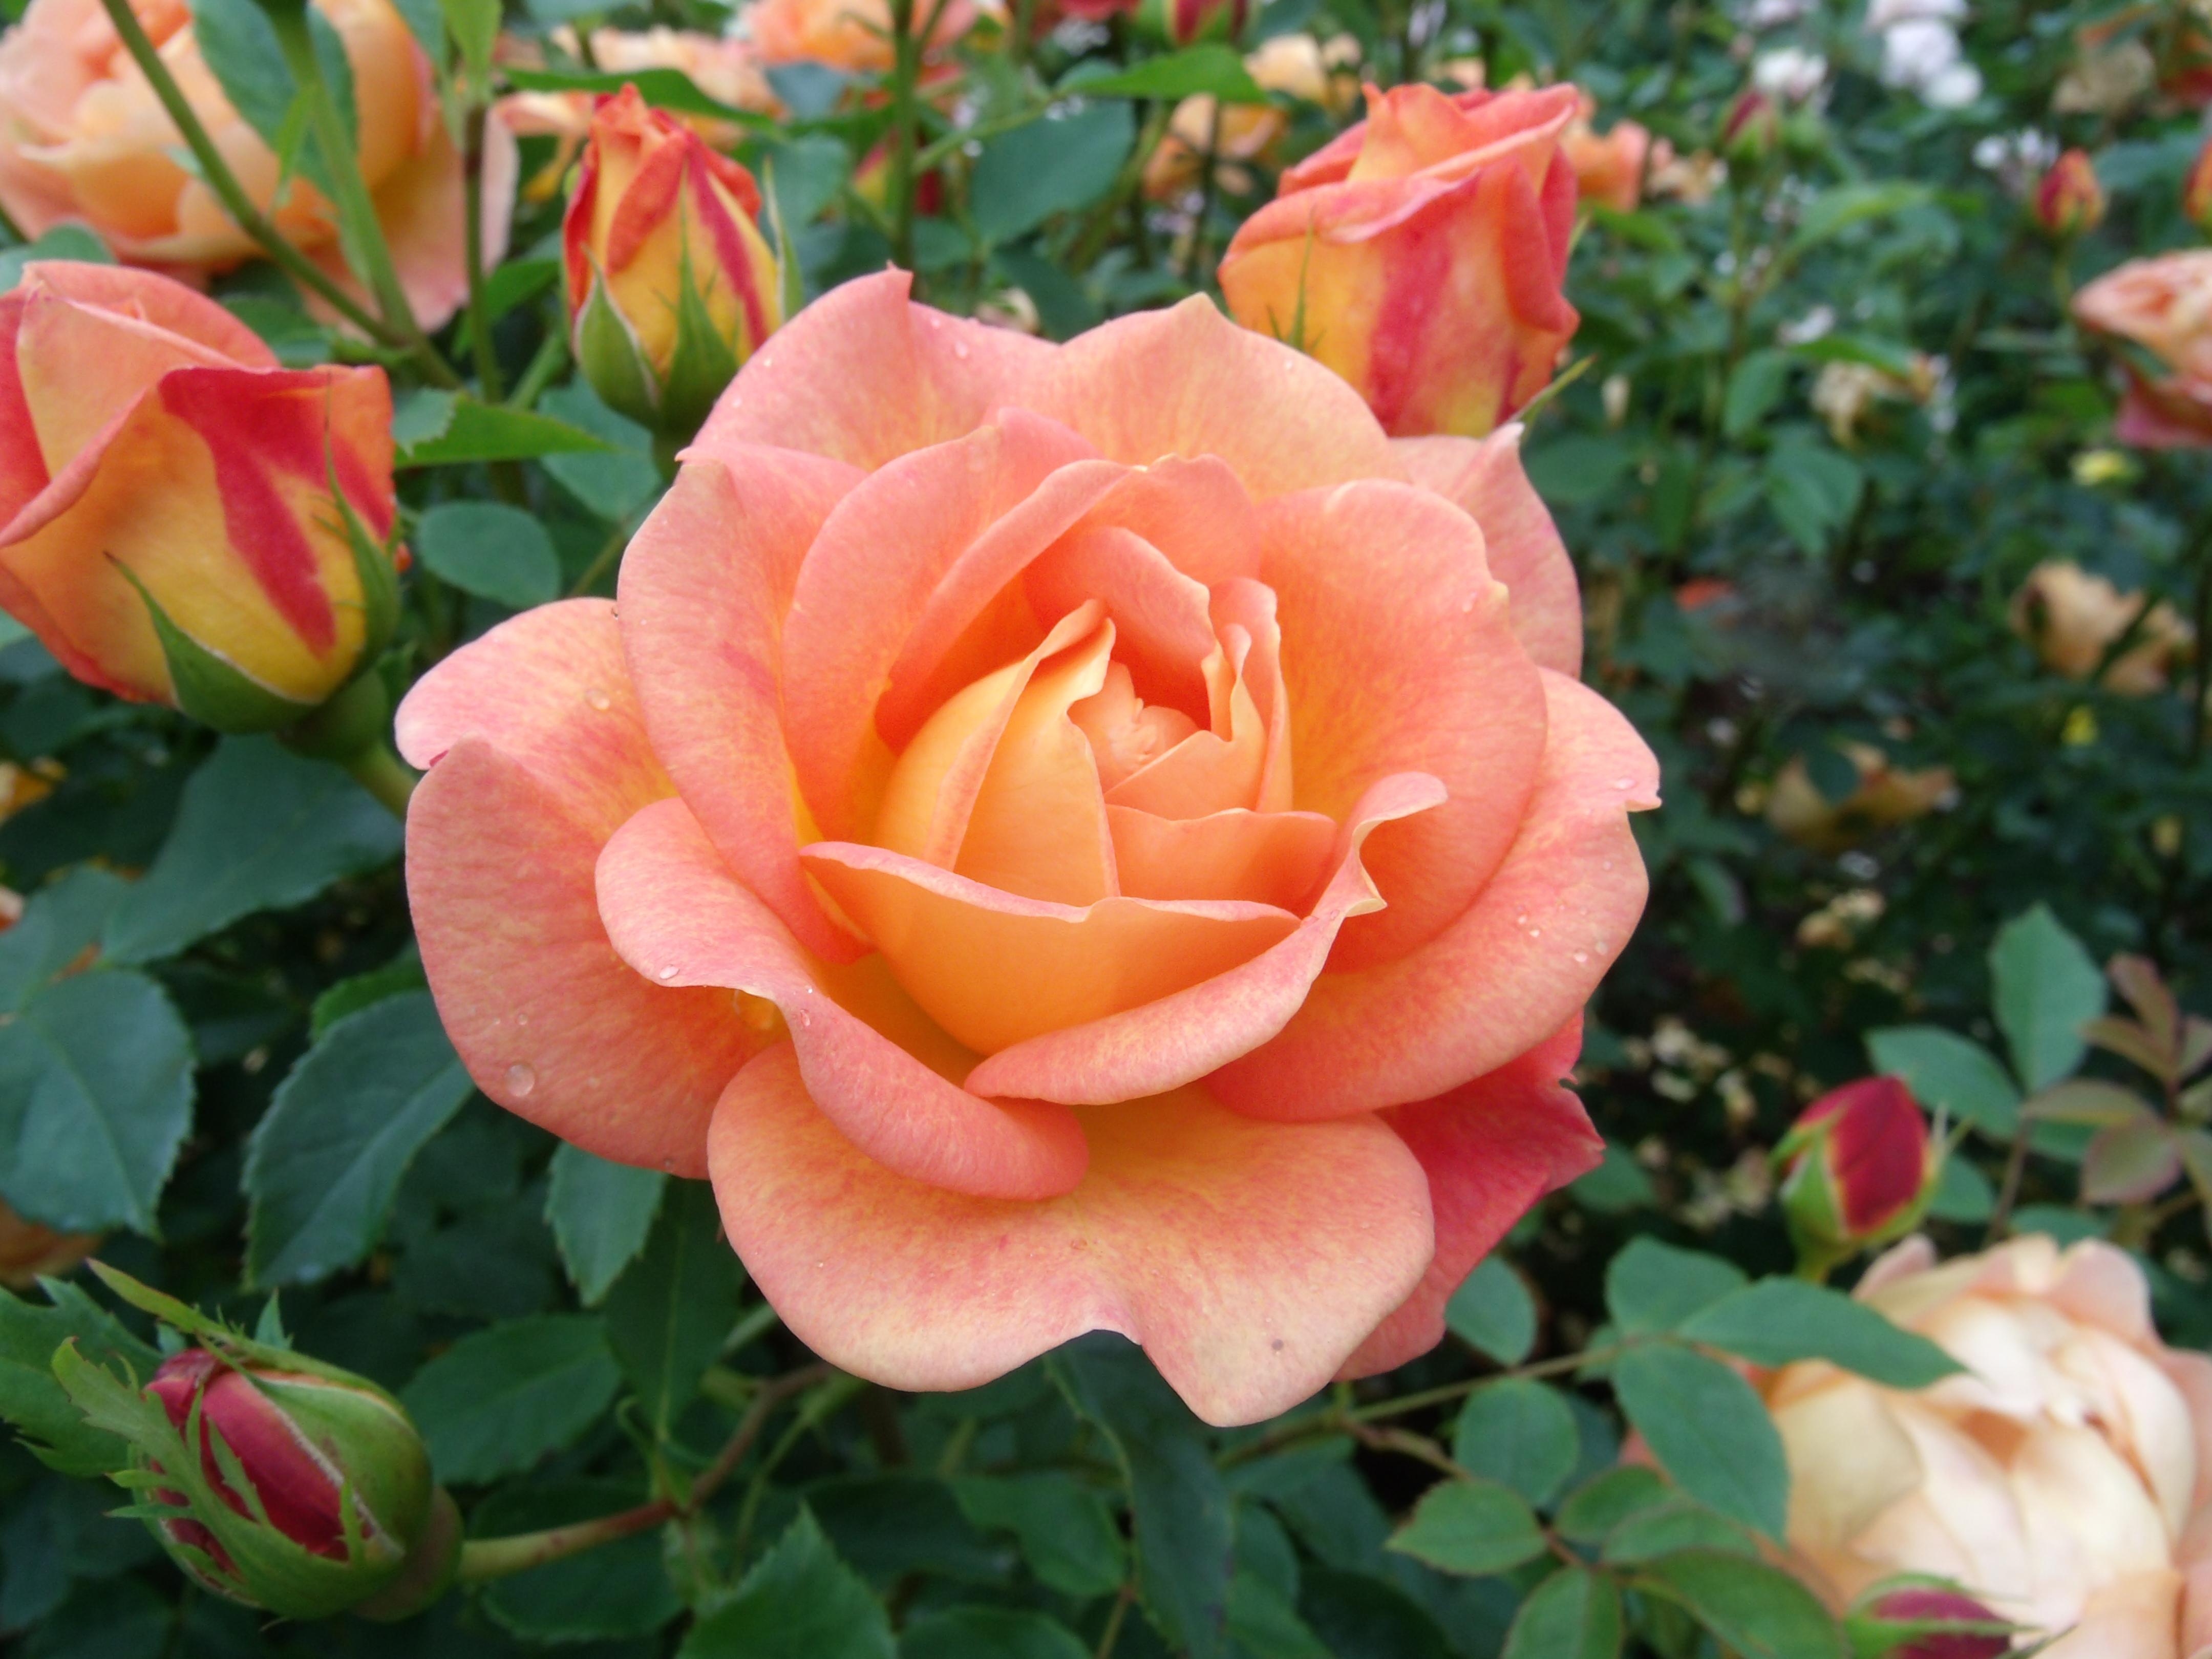 Blüte der Rosensorte 'Lady of Shalott'